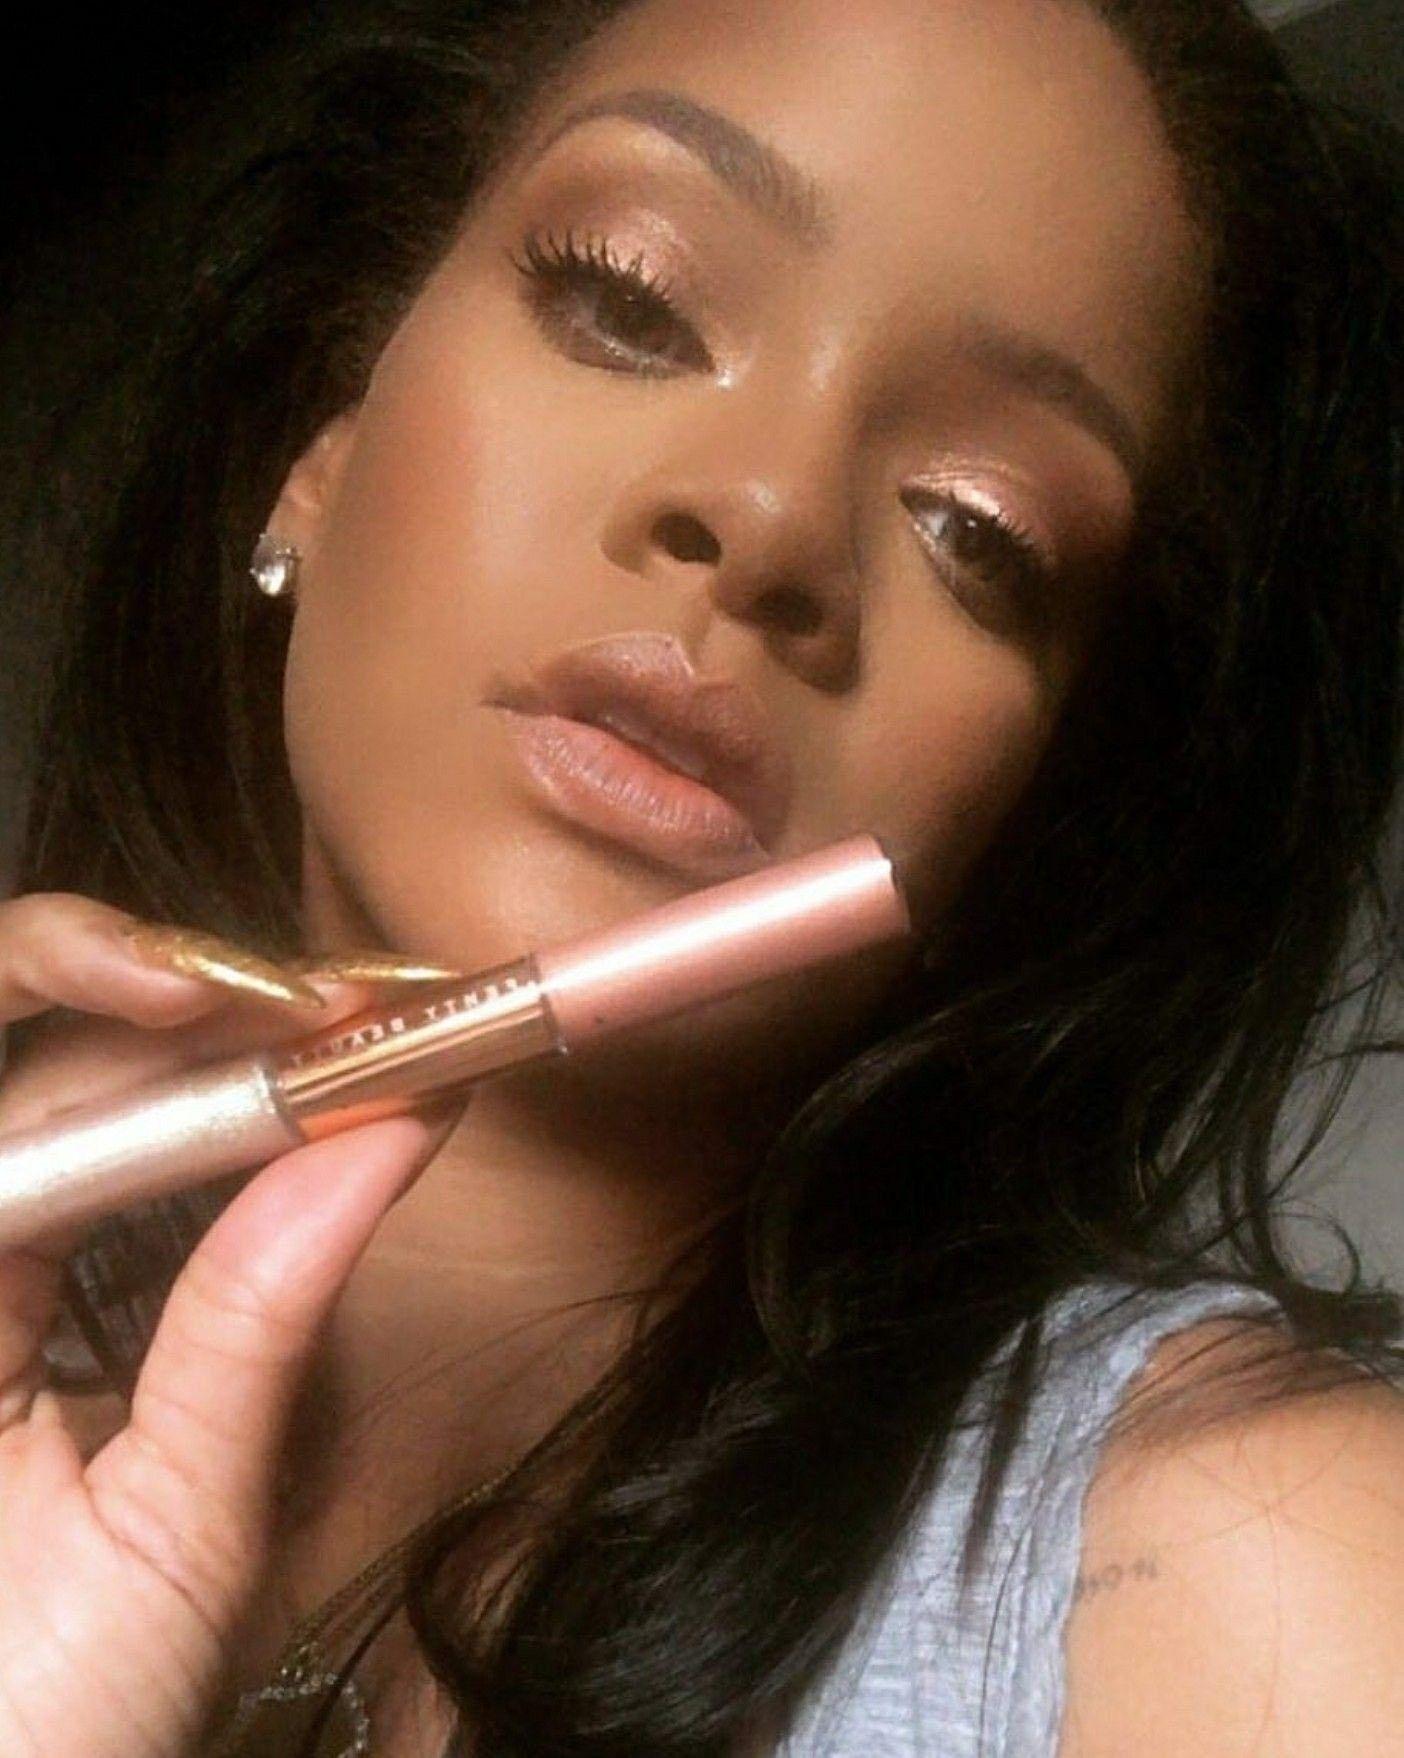 Pin by Nadeen jackson on idols | Rihanna makeup, Rihanna